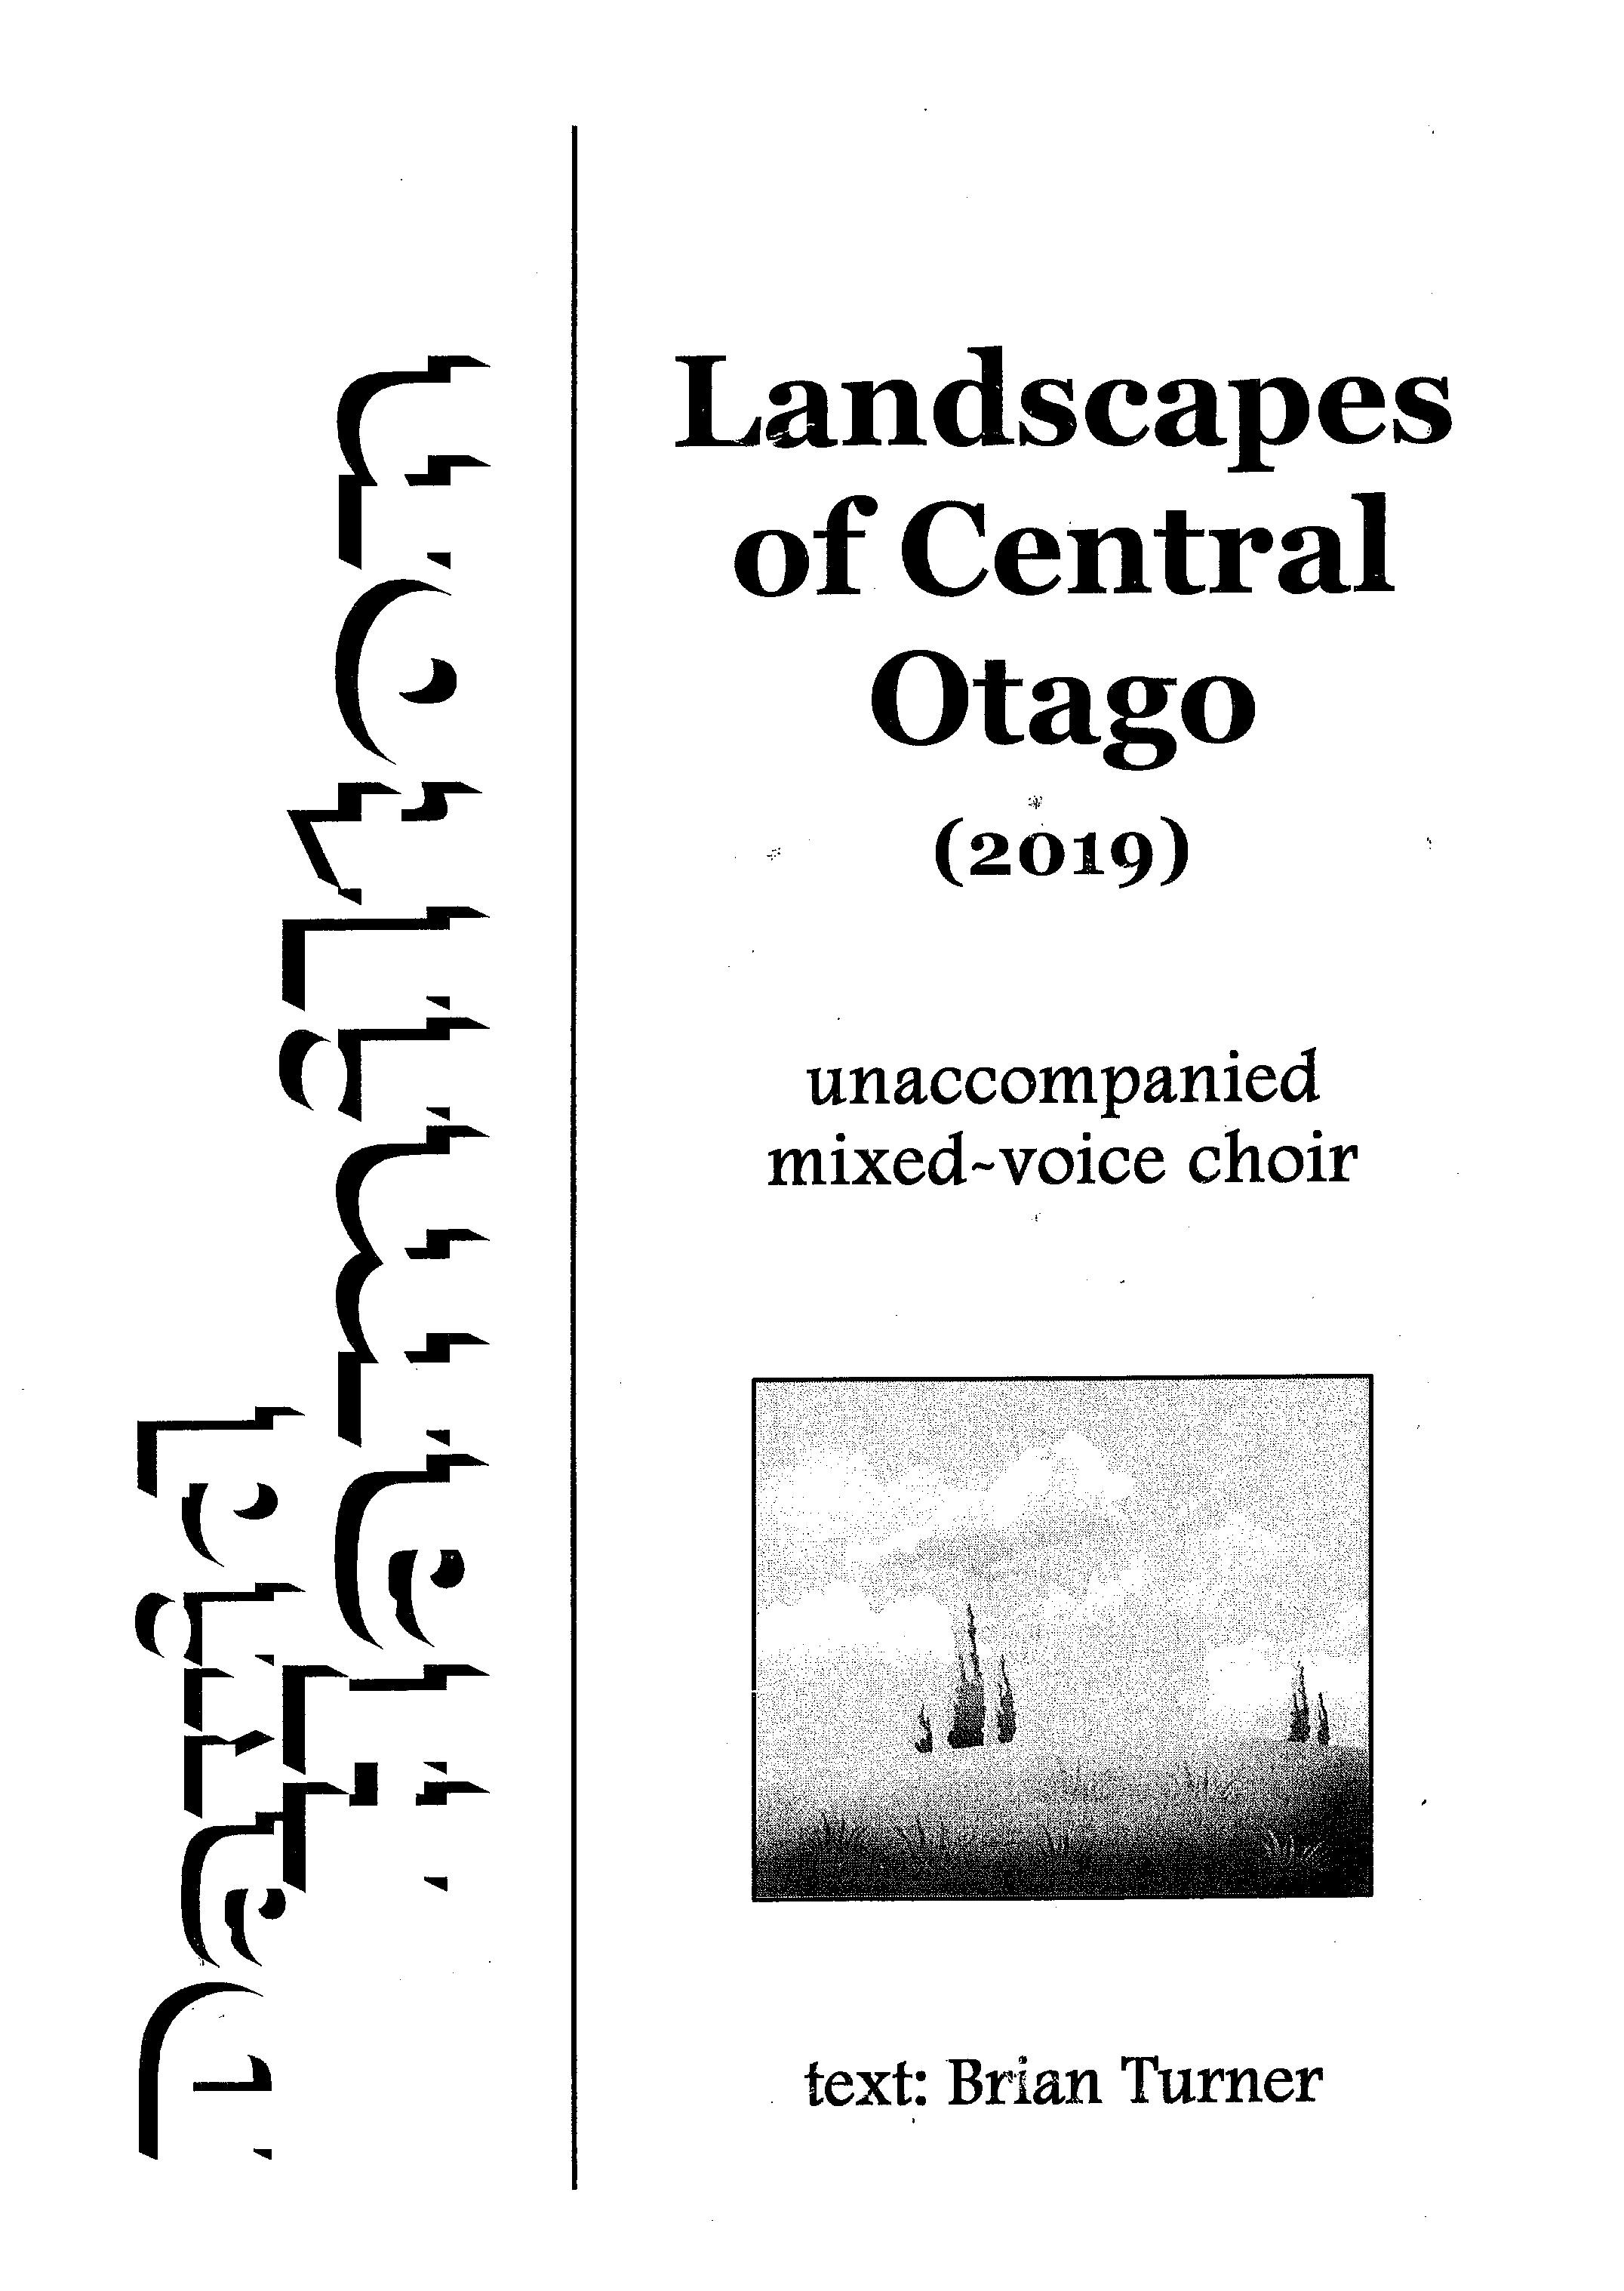 David Hamilton: Landscapes of Central Otago - hardcopy SCORE